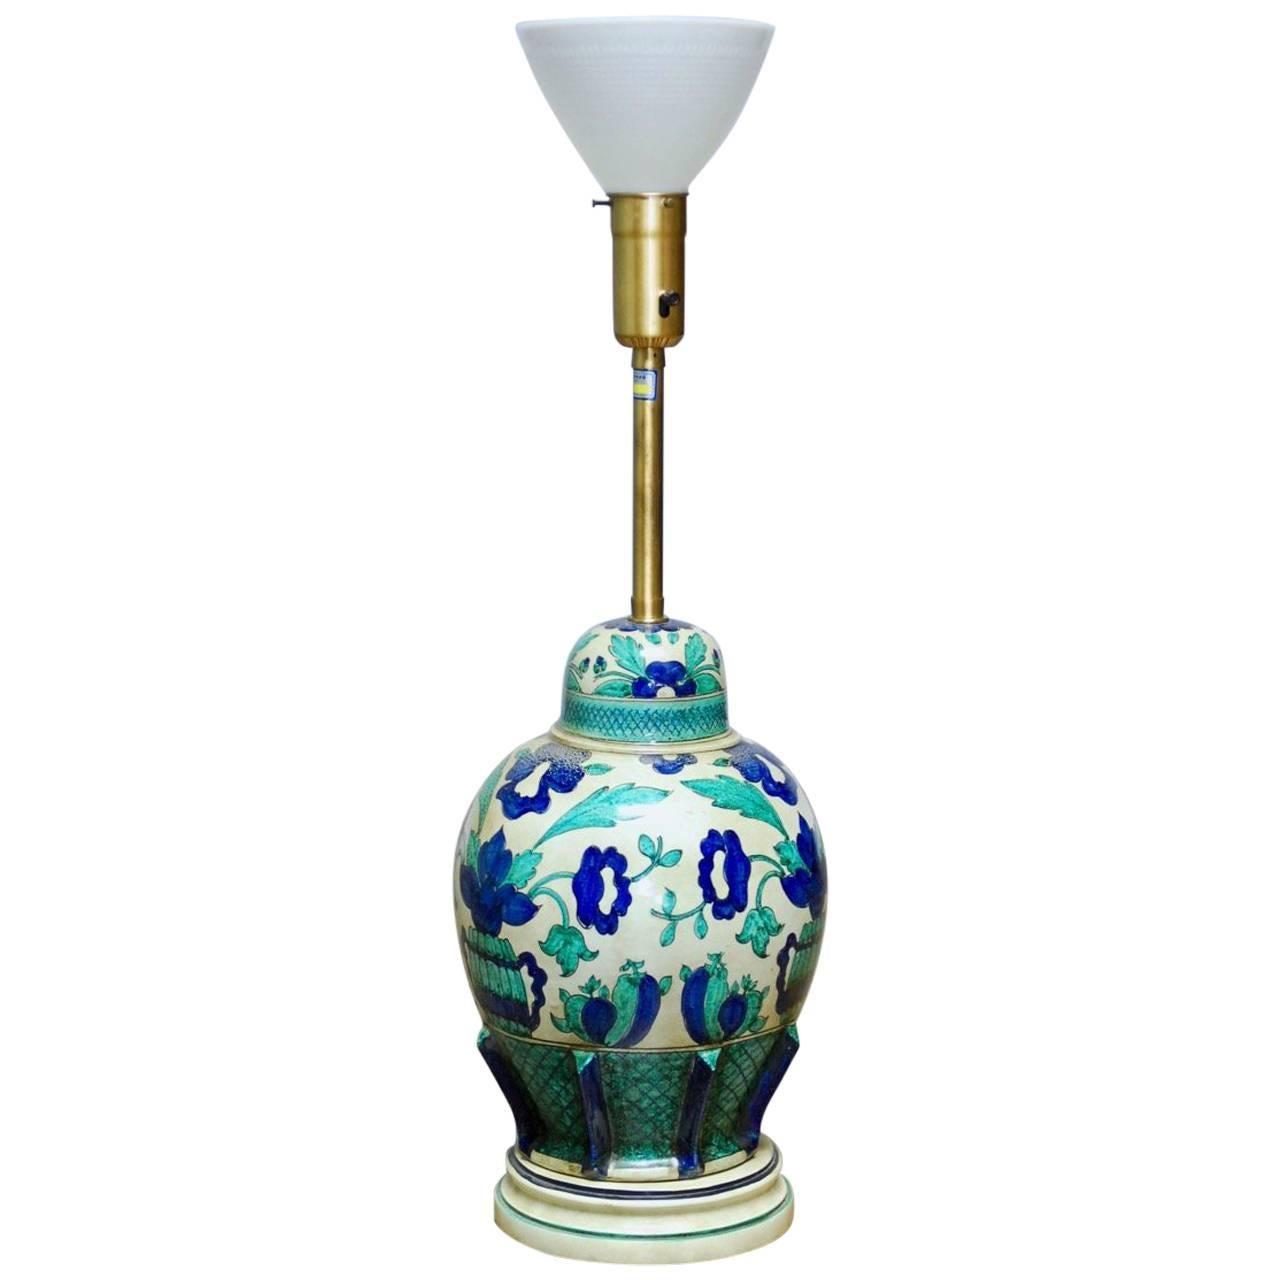 Italian Ceramic Faience Table Lamp by Marbro